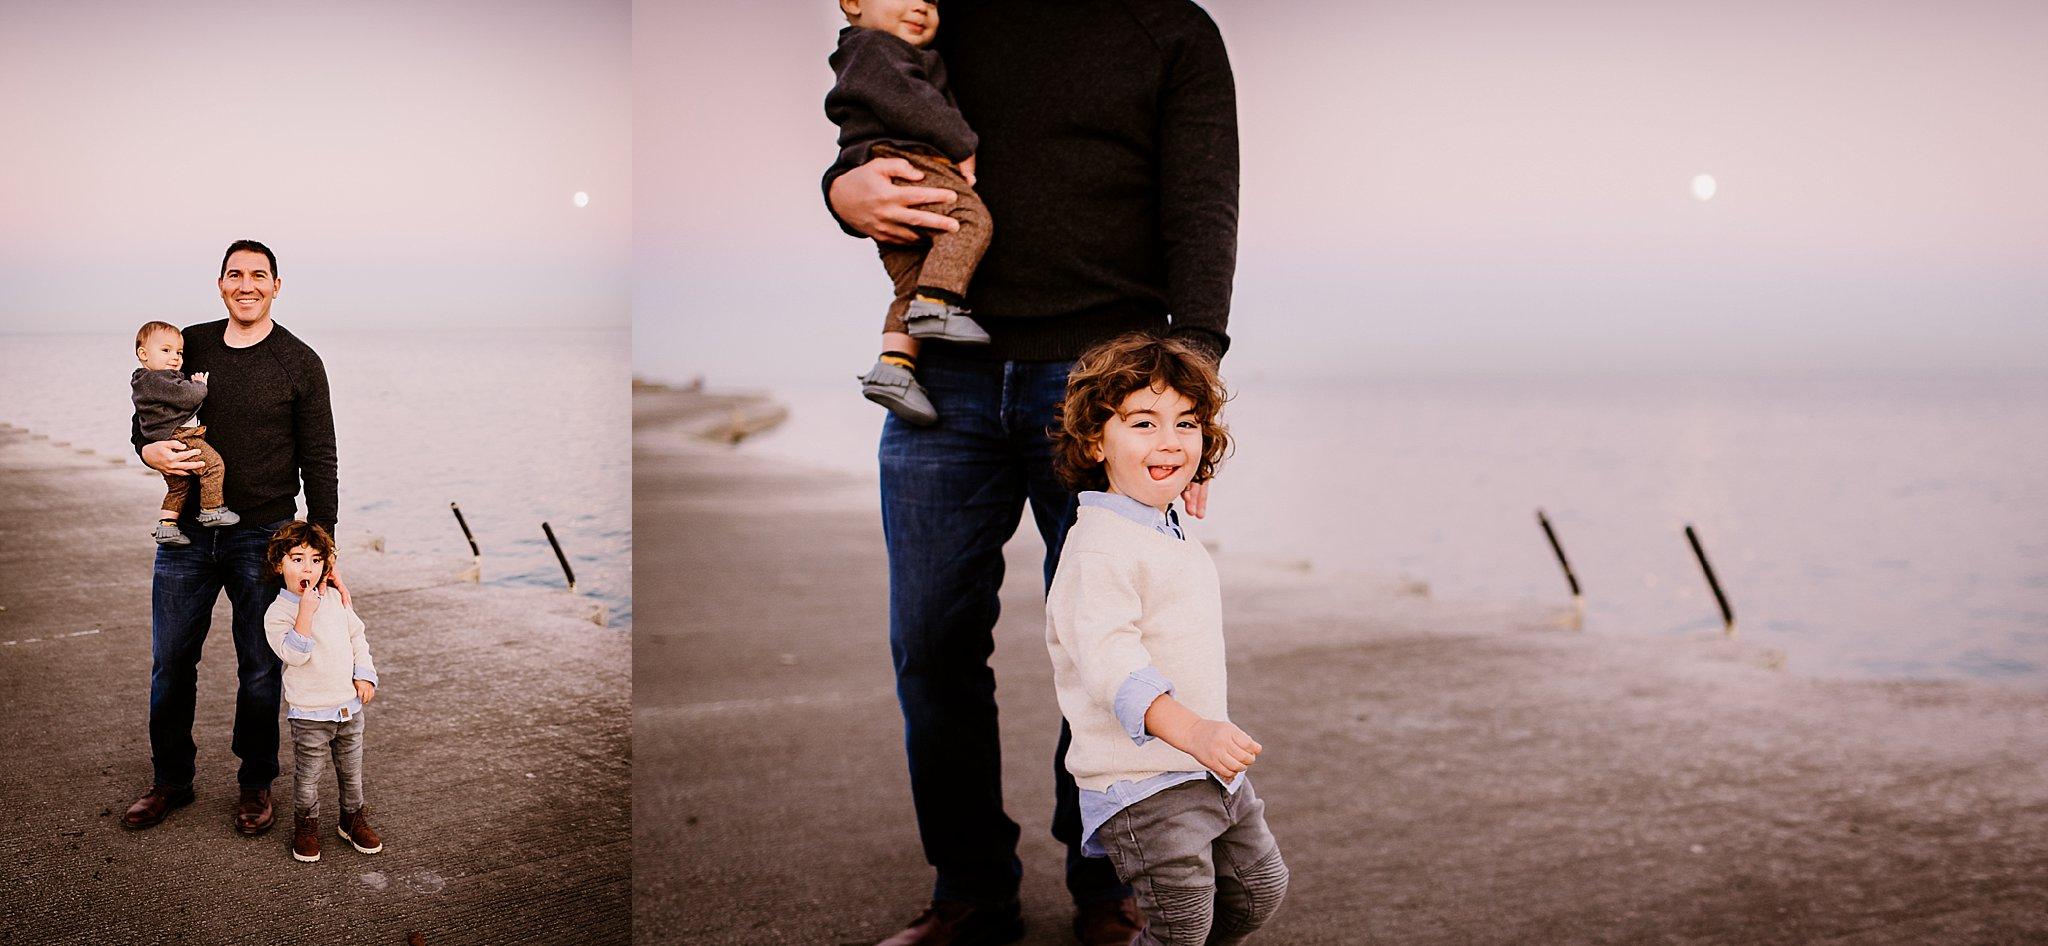 chicago family photographers www.heatherhackney.com montose harbor family session.jpg